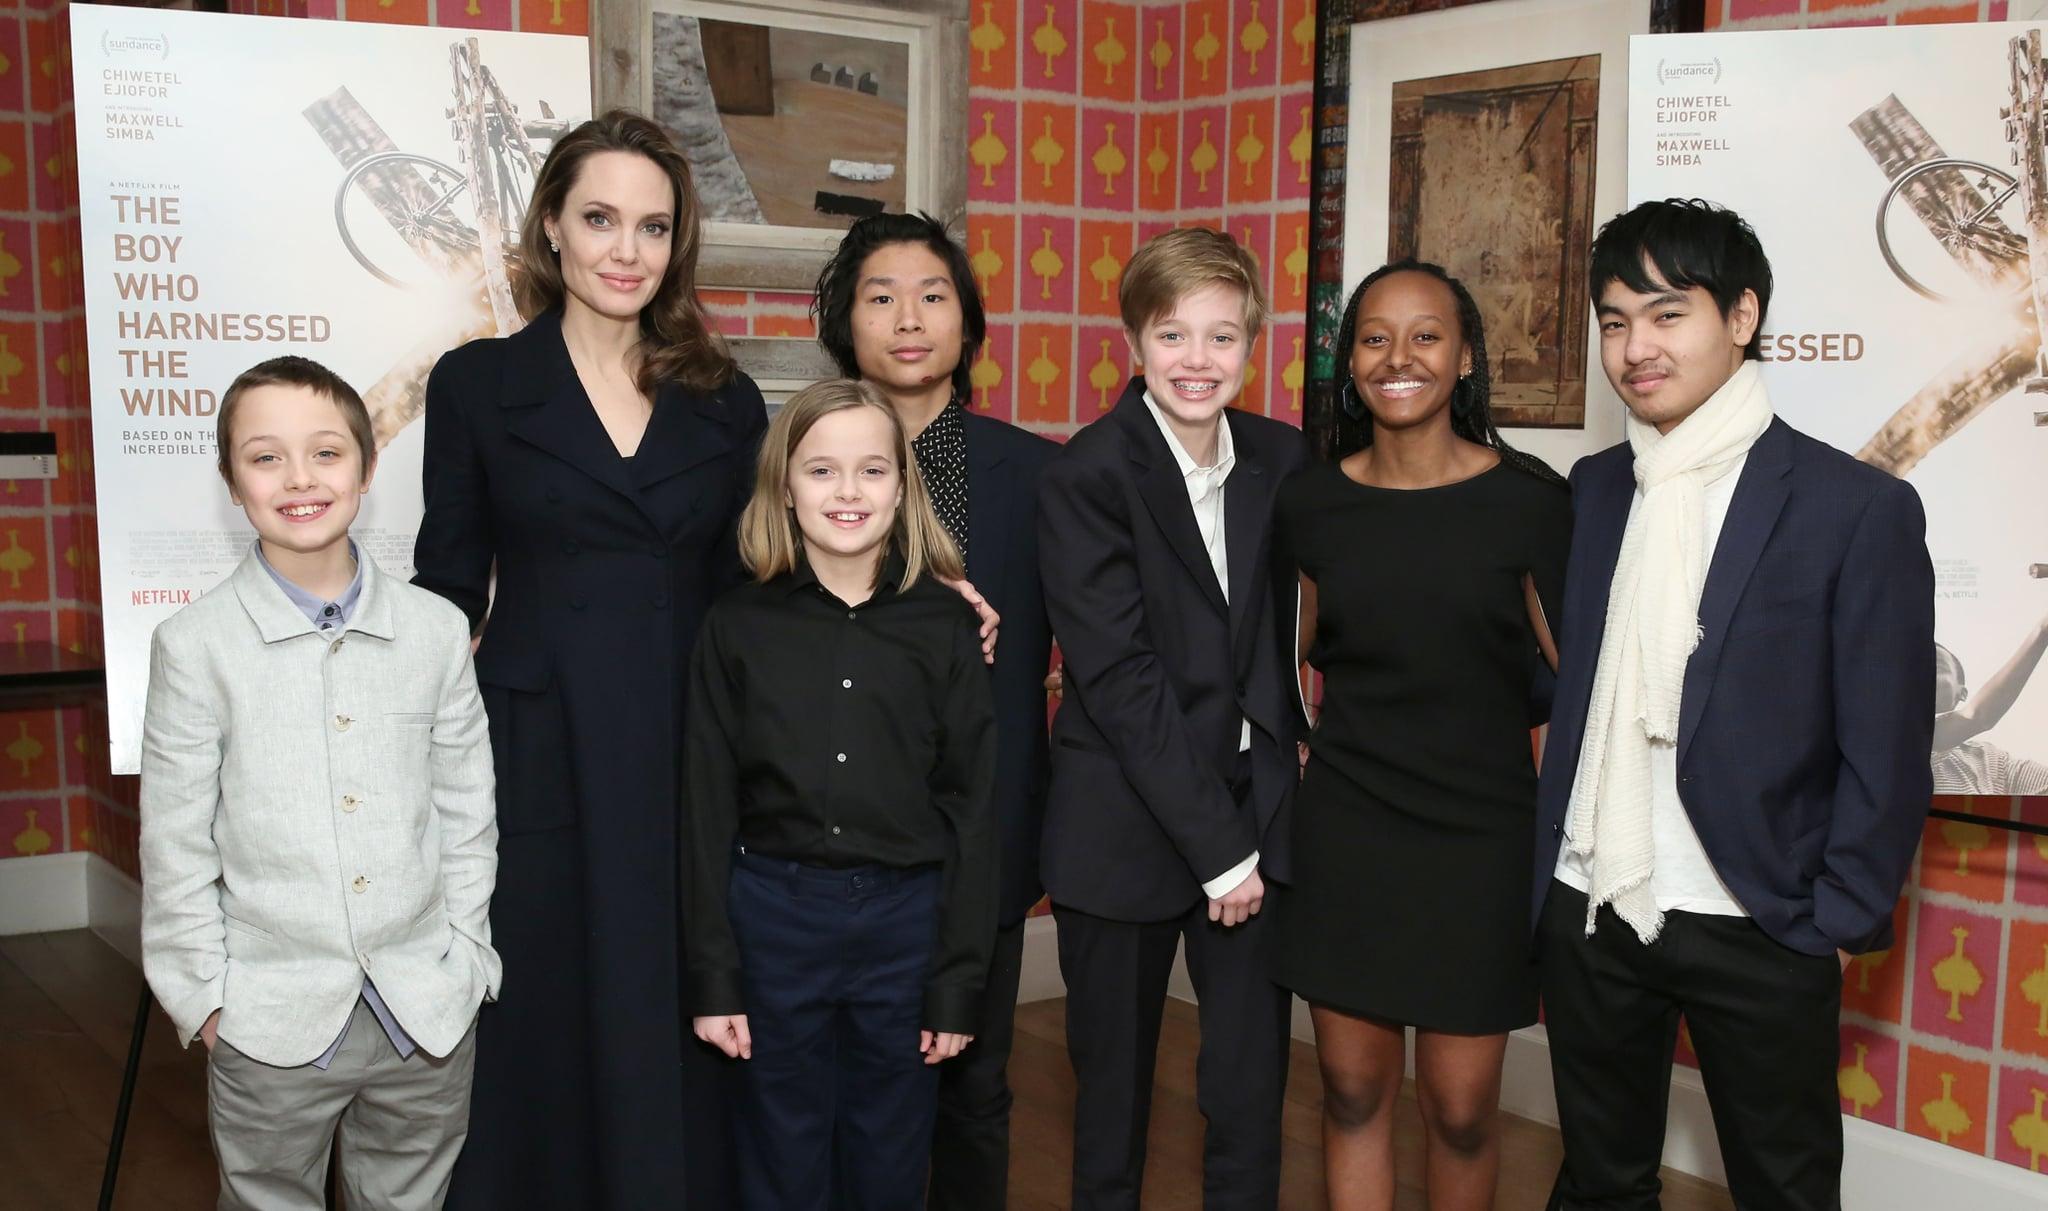 NEW YORK, NEW YORK - FEBRUARY 25: Angelina Jolie with children Knox Leon Jolie-Pitt, Vivienne Marcheline Jolie-Pitt, Pax Thien Jolie-Pitt, Shiloh Nouvel Jolie-Pitt, Zahara Marley Jolie-Pitt and Maddox Chivan Jolie-Pitt attend